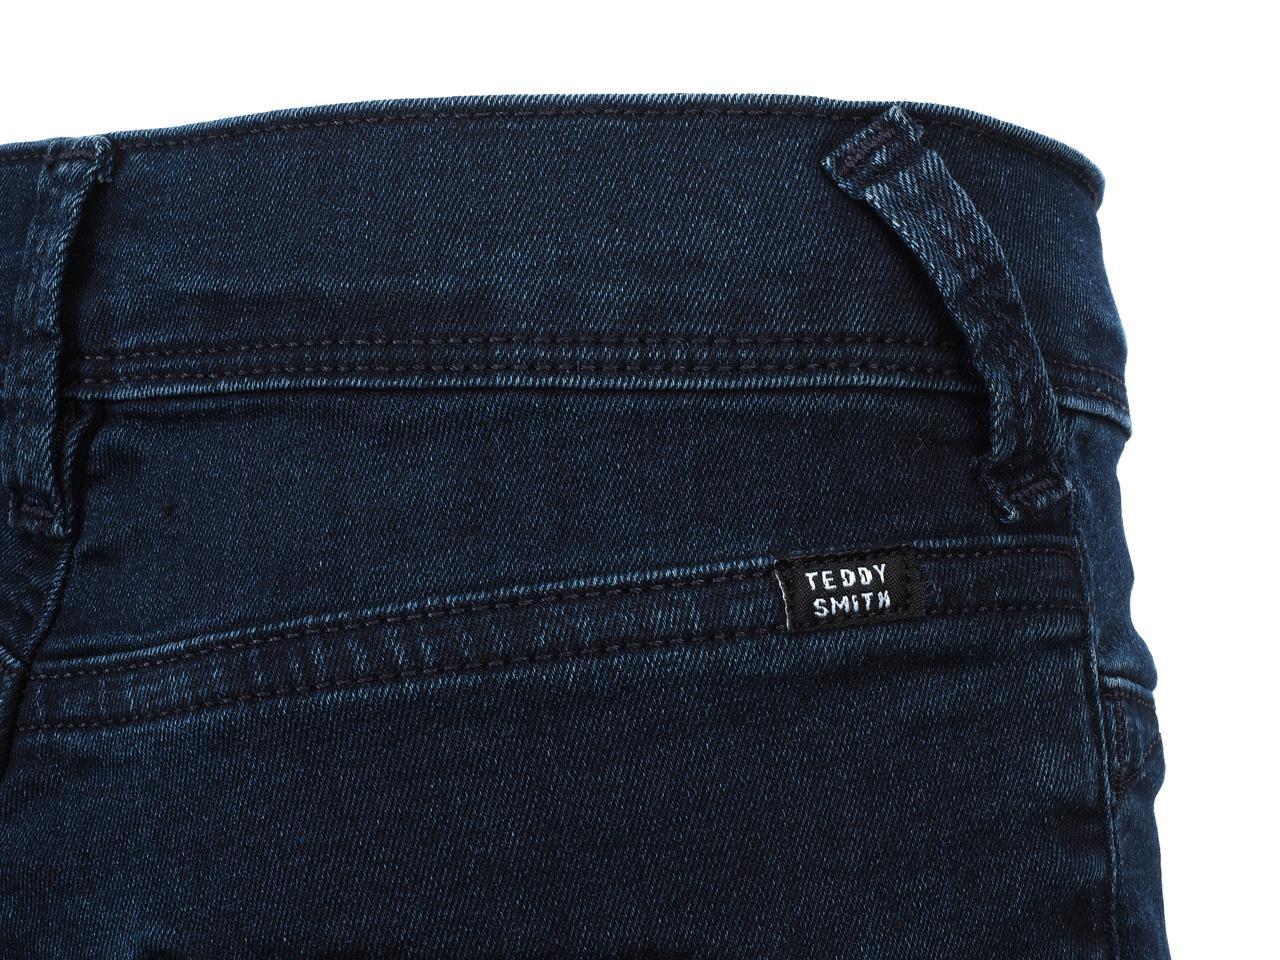 Pantalon-jeans-Teddy-smith-The-jeg-navy-jeans-girl-Bleu-24306-Neuf miniature 4